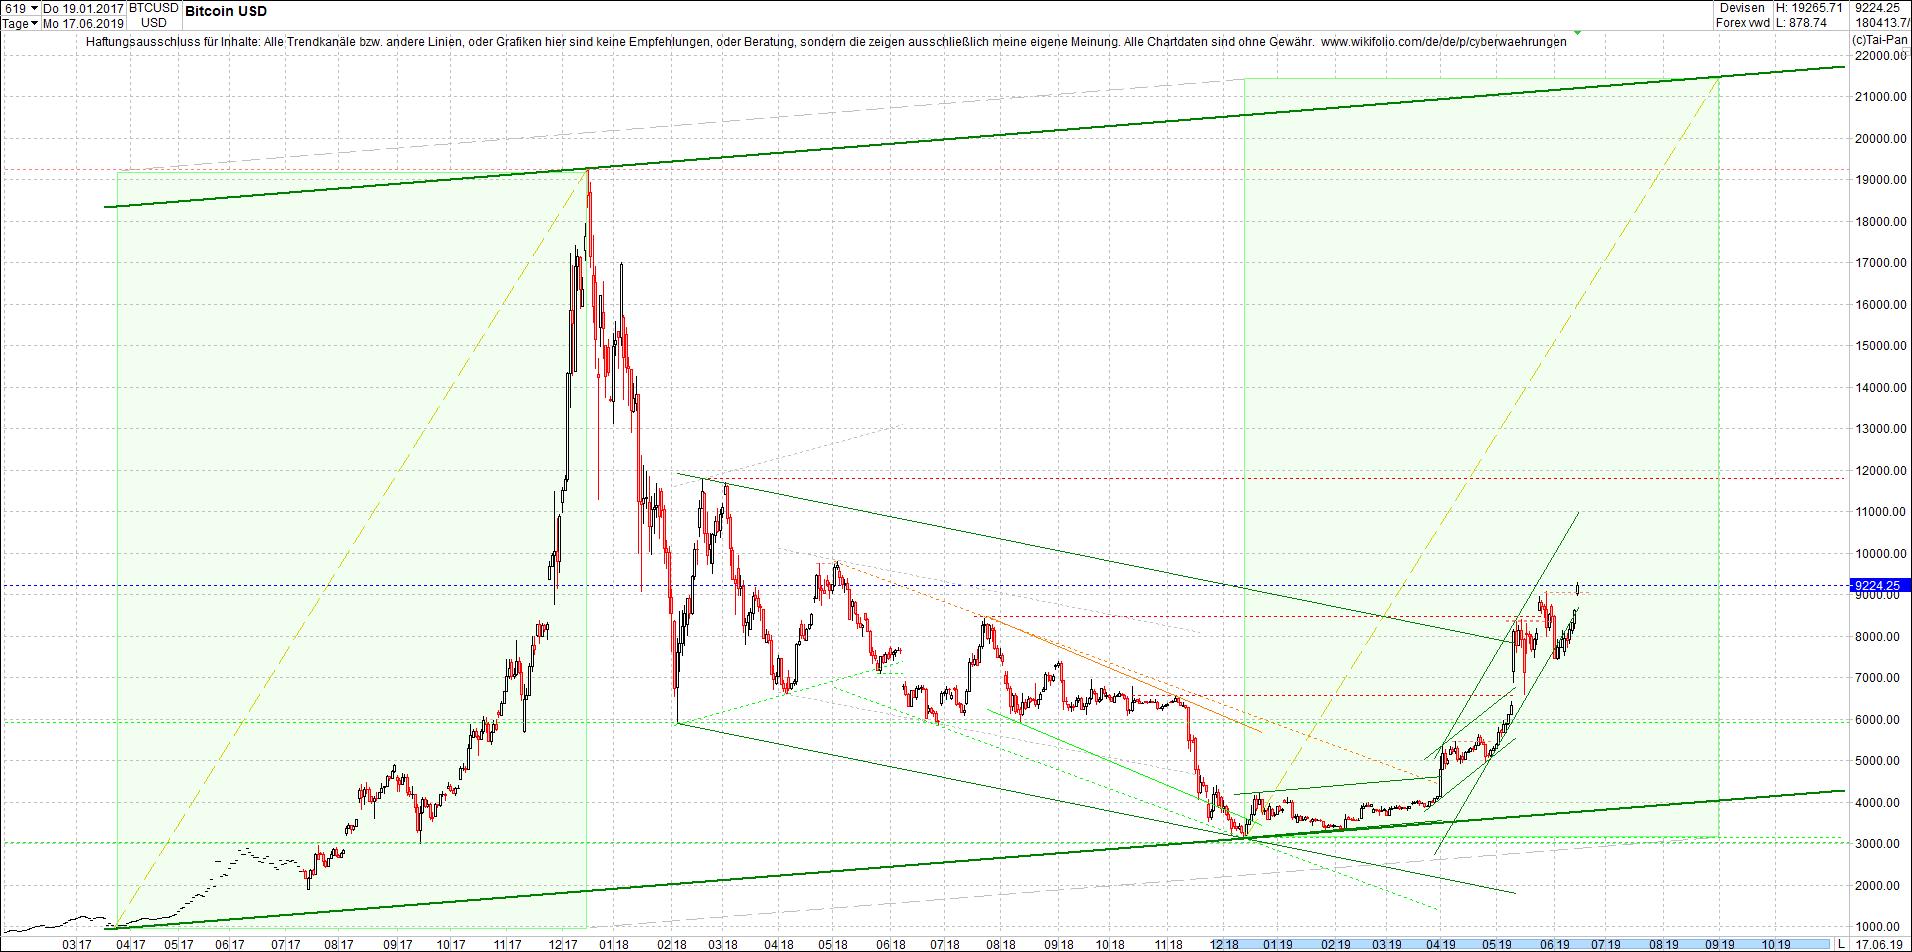 bitcoin_(btc)_chart_heute_abend.png